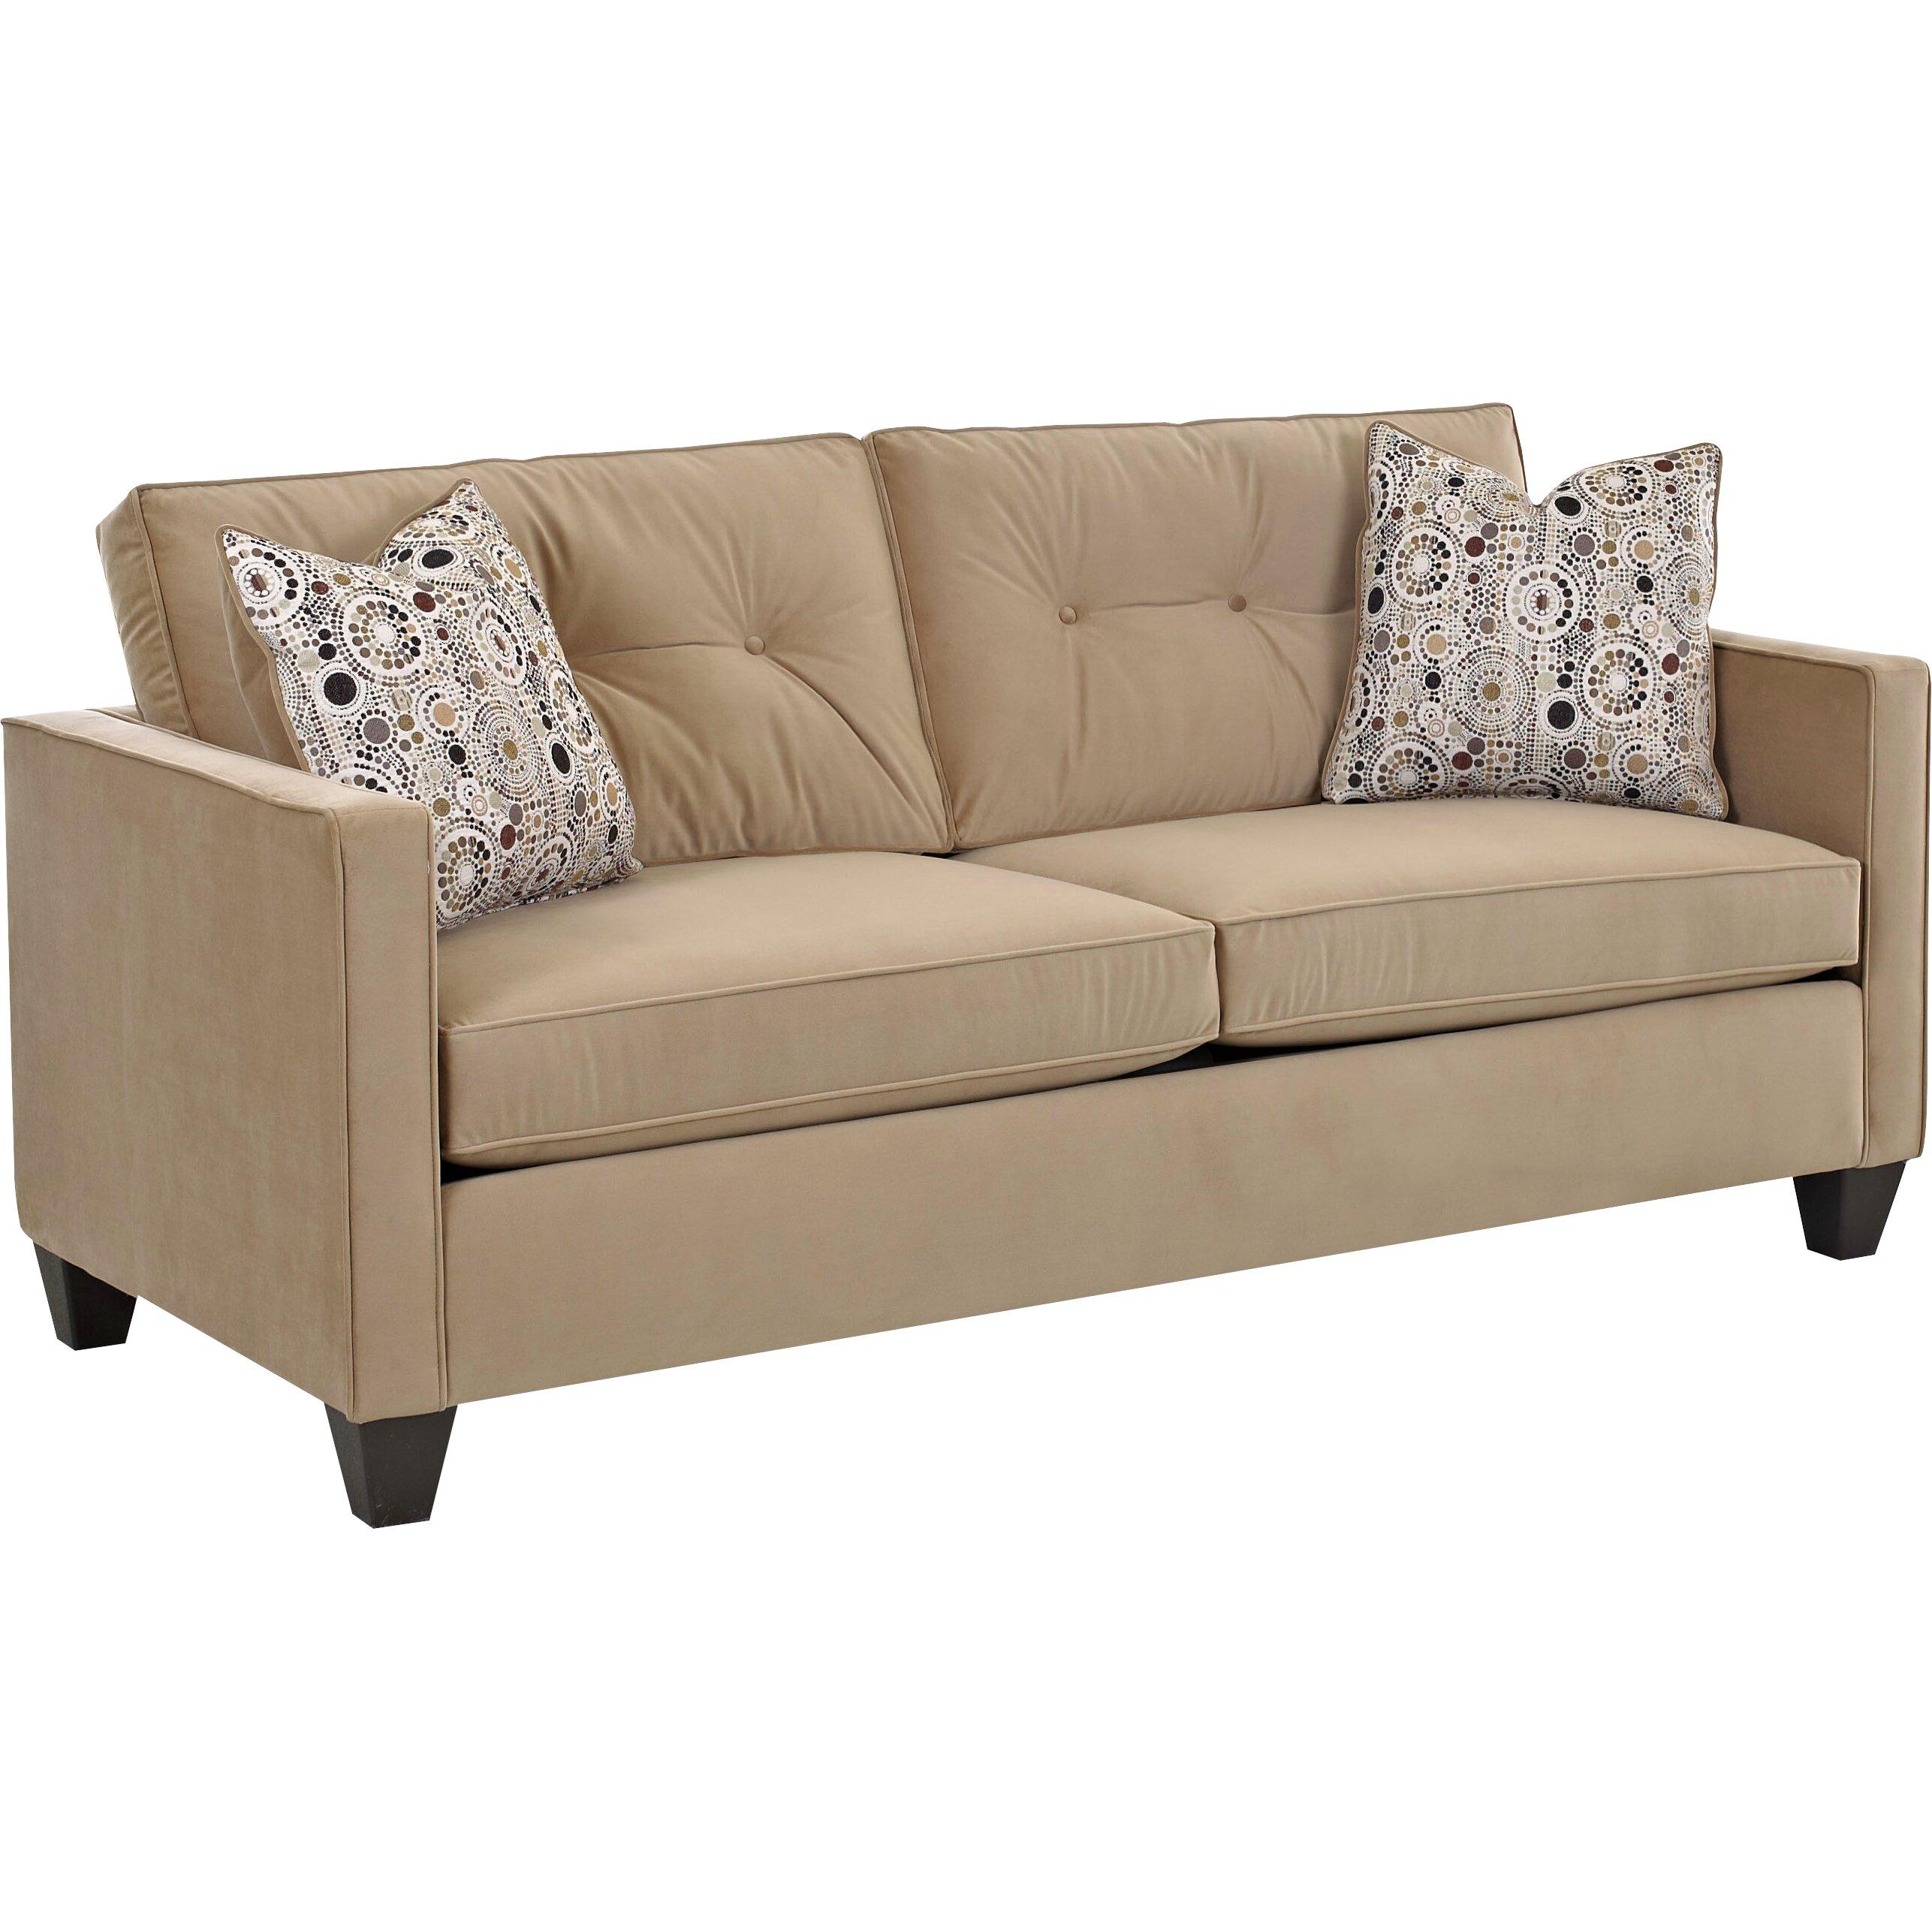 Klaussner furniture derry sofa reviews wayfair for Klaussner sofa